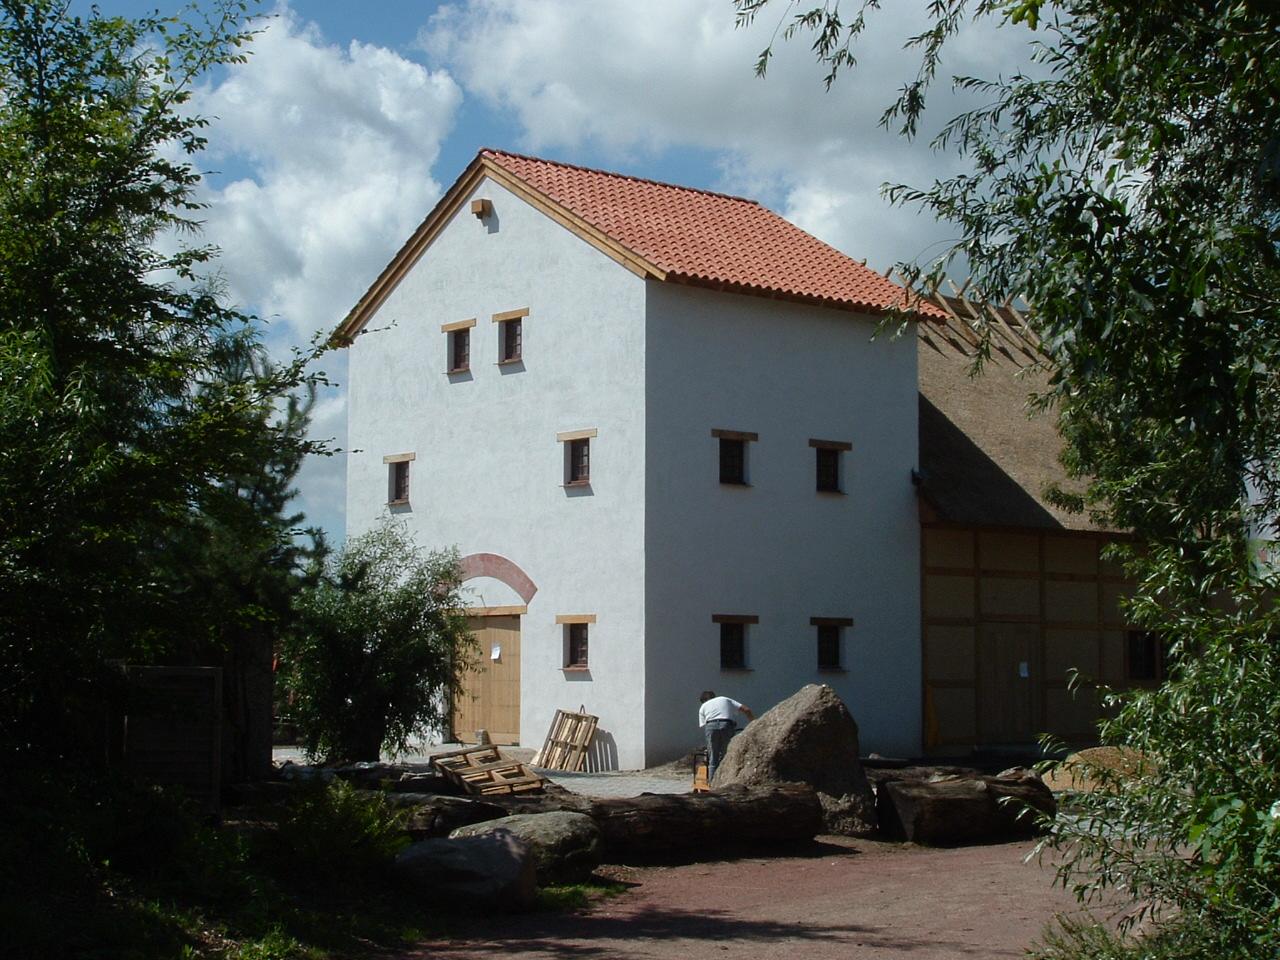 Archeologiehuis